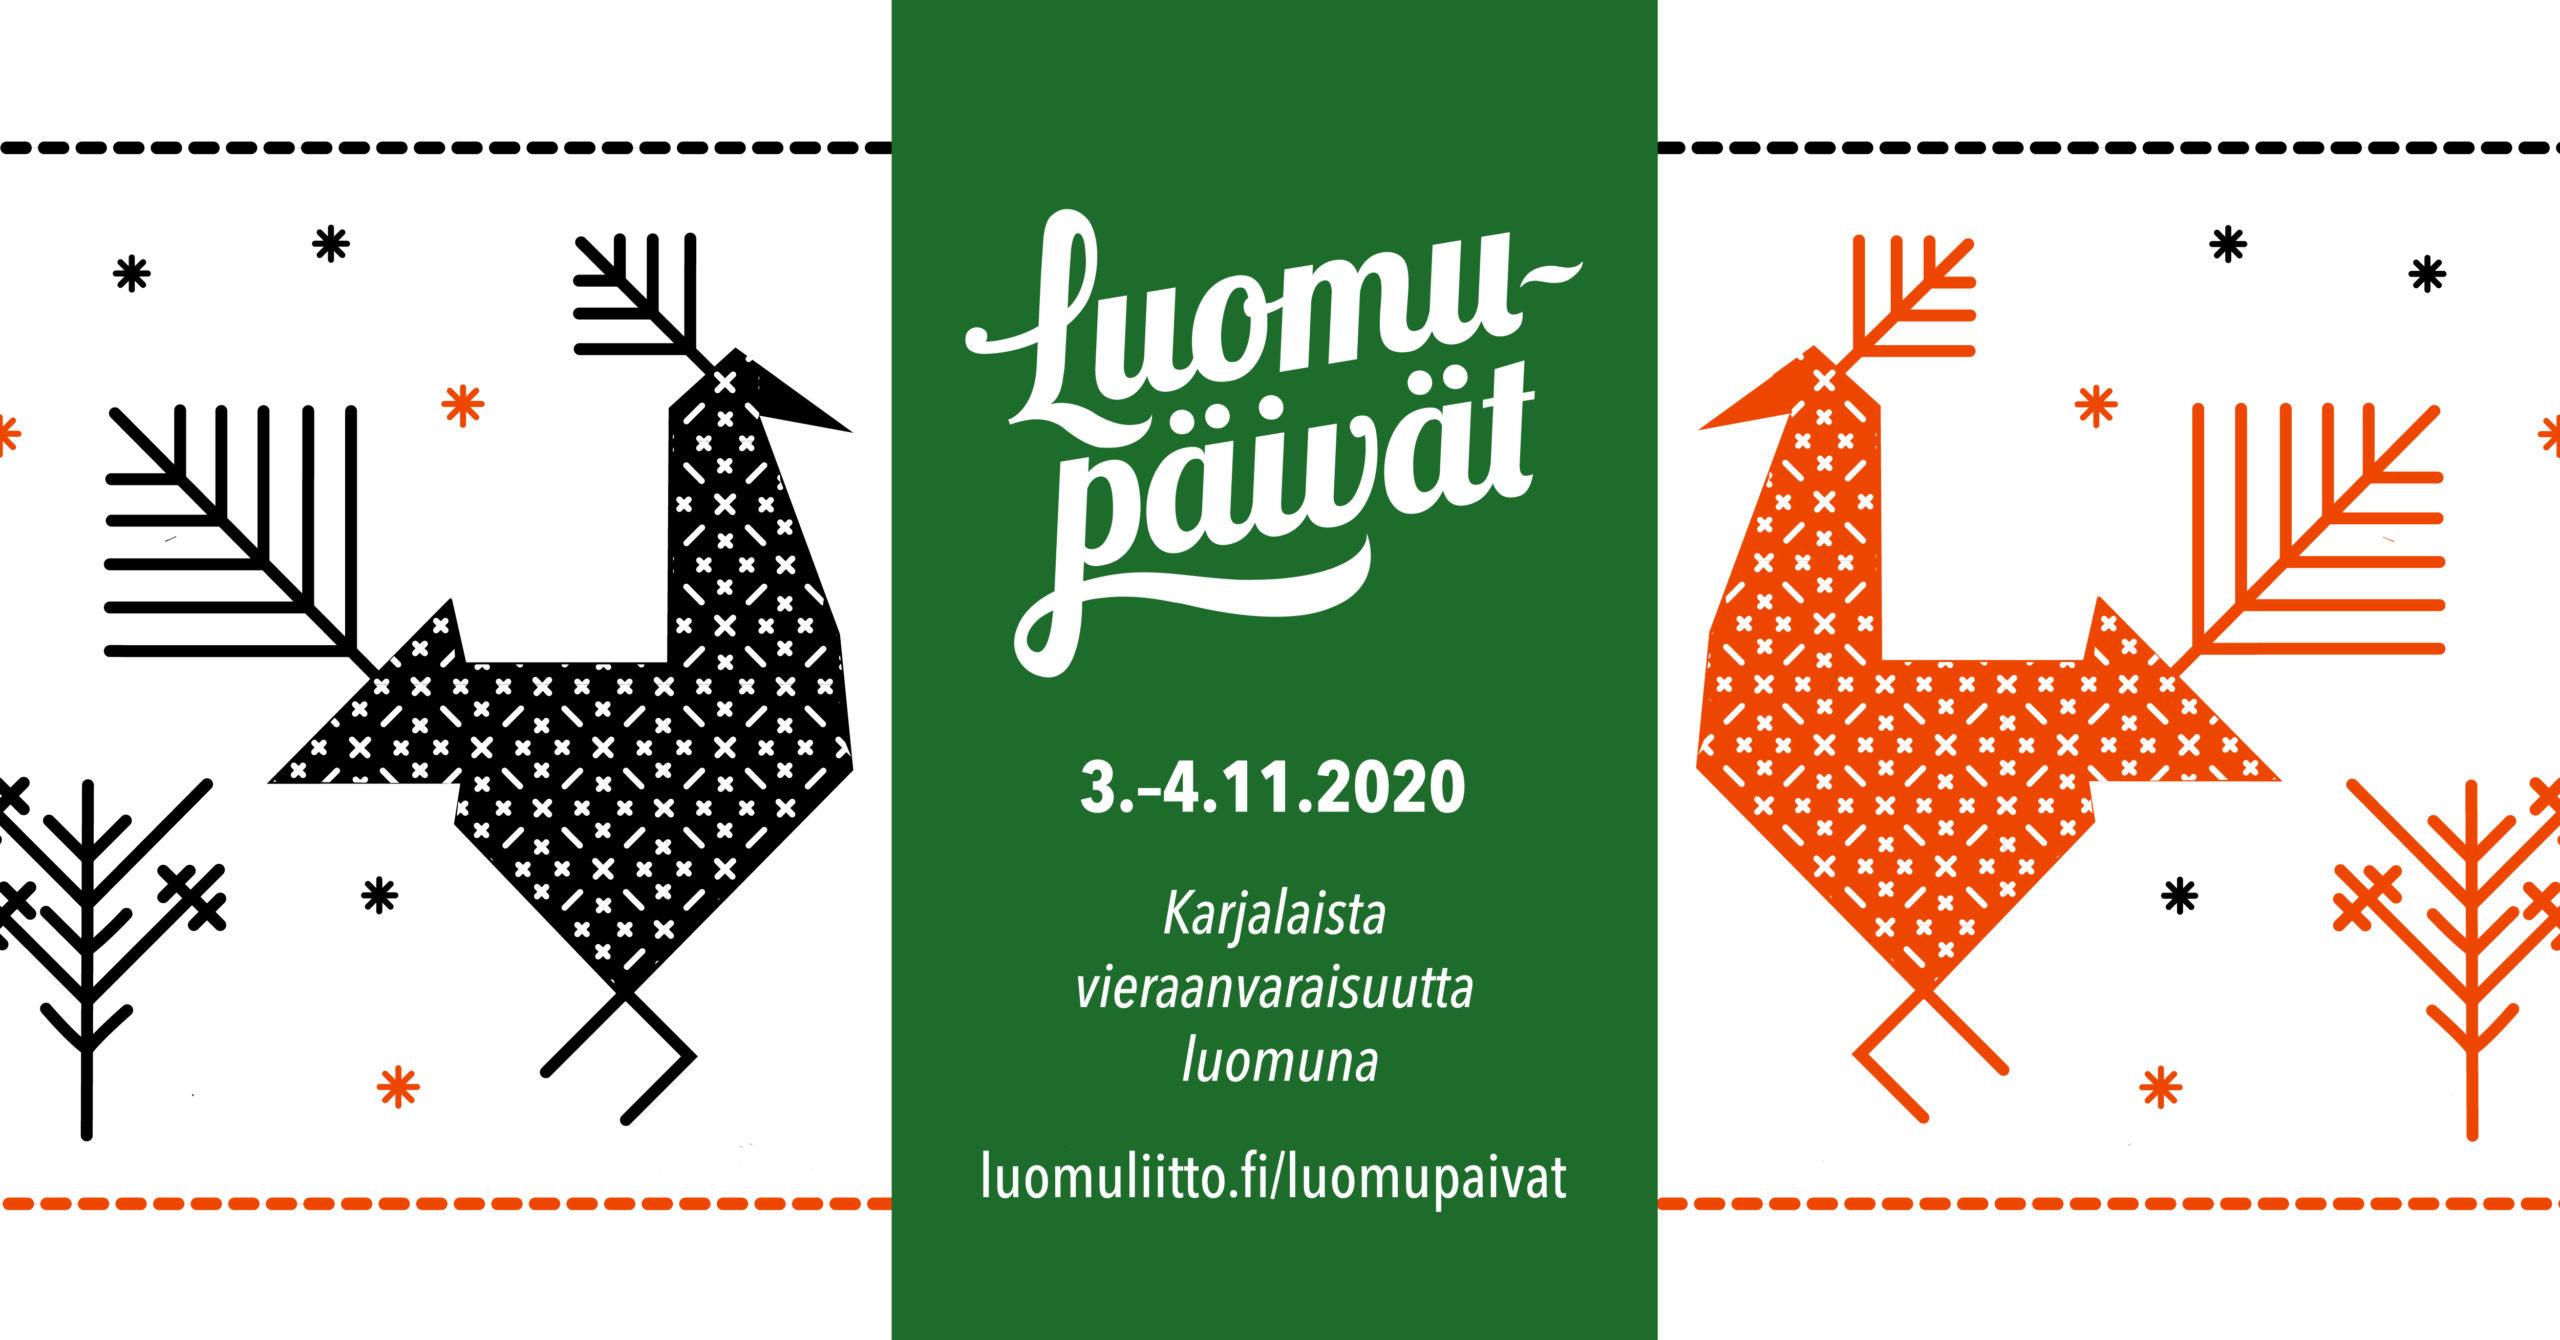 facebook-postaus-luomupaivat-01-scaled.jpg